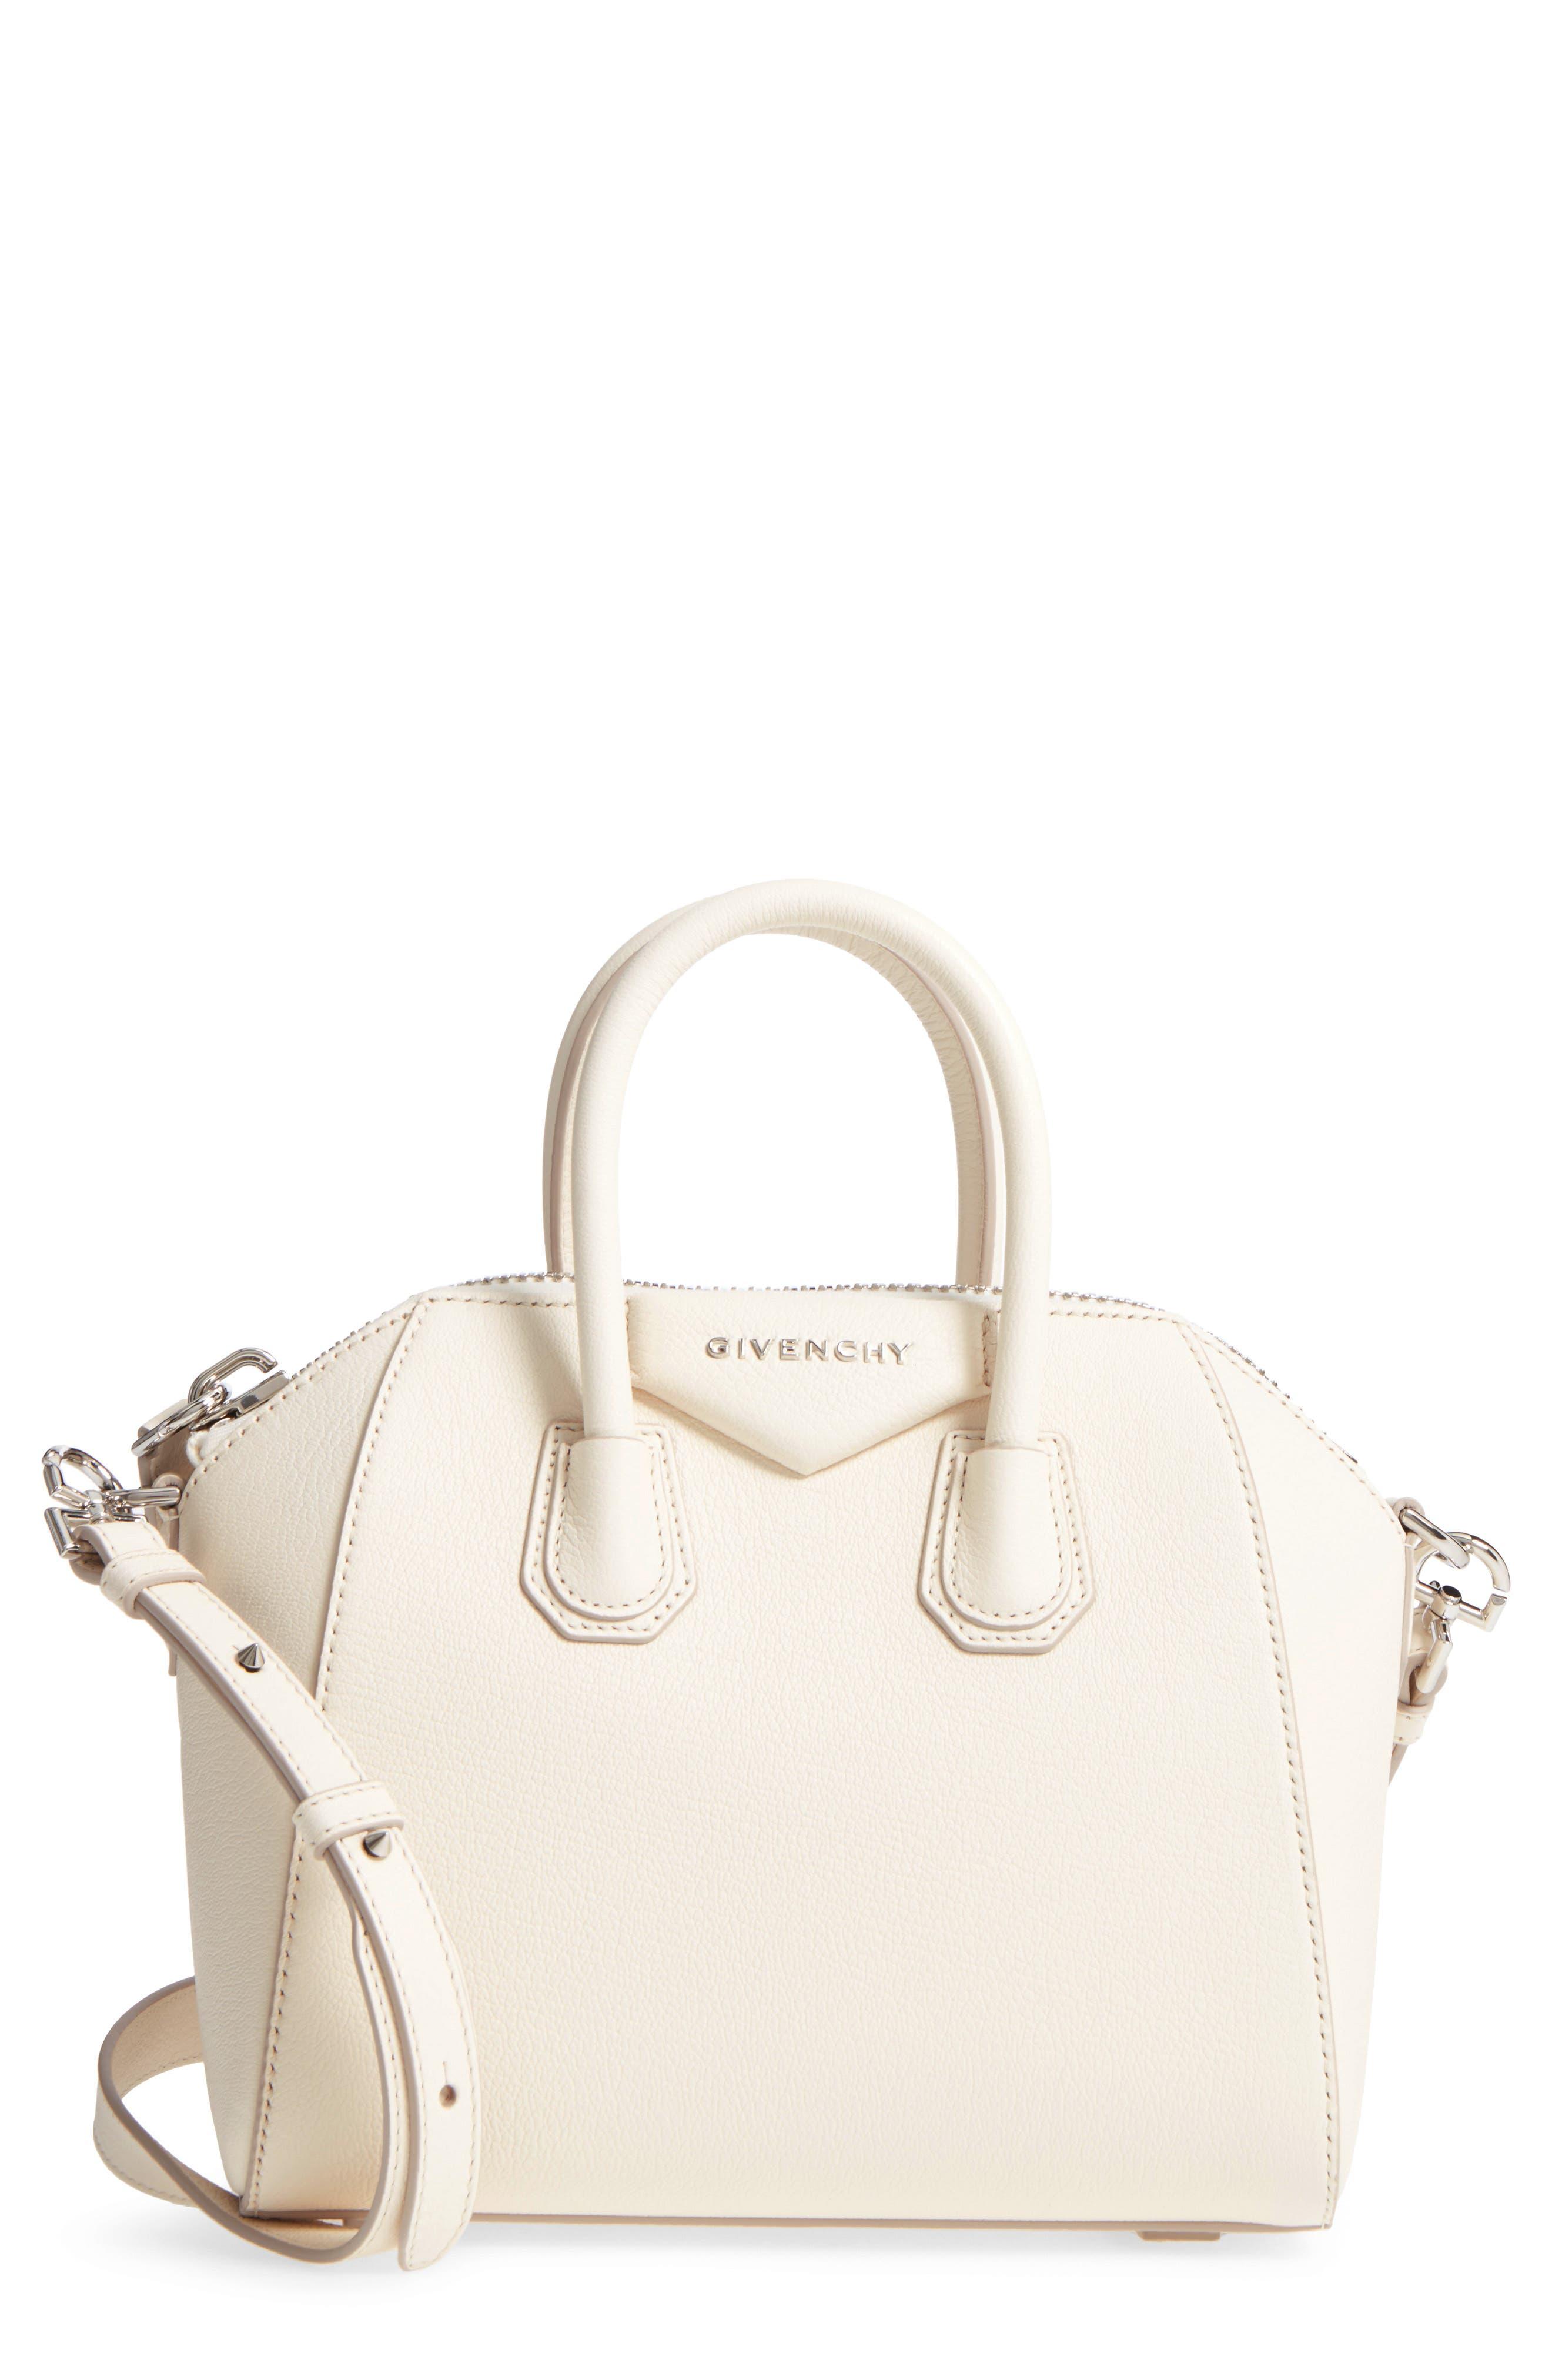 Alternate Image 1 Selected - Givenchy 'Mini Antigona' Sugar Leather Satchel